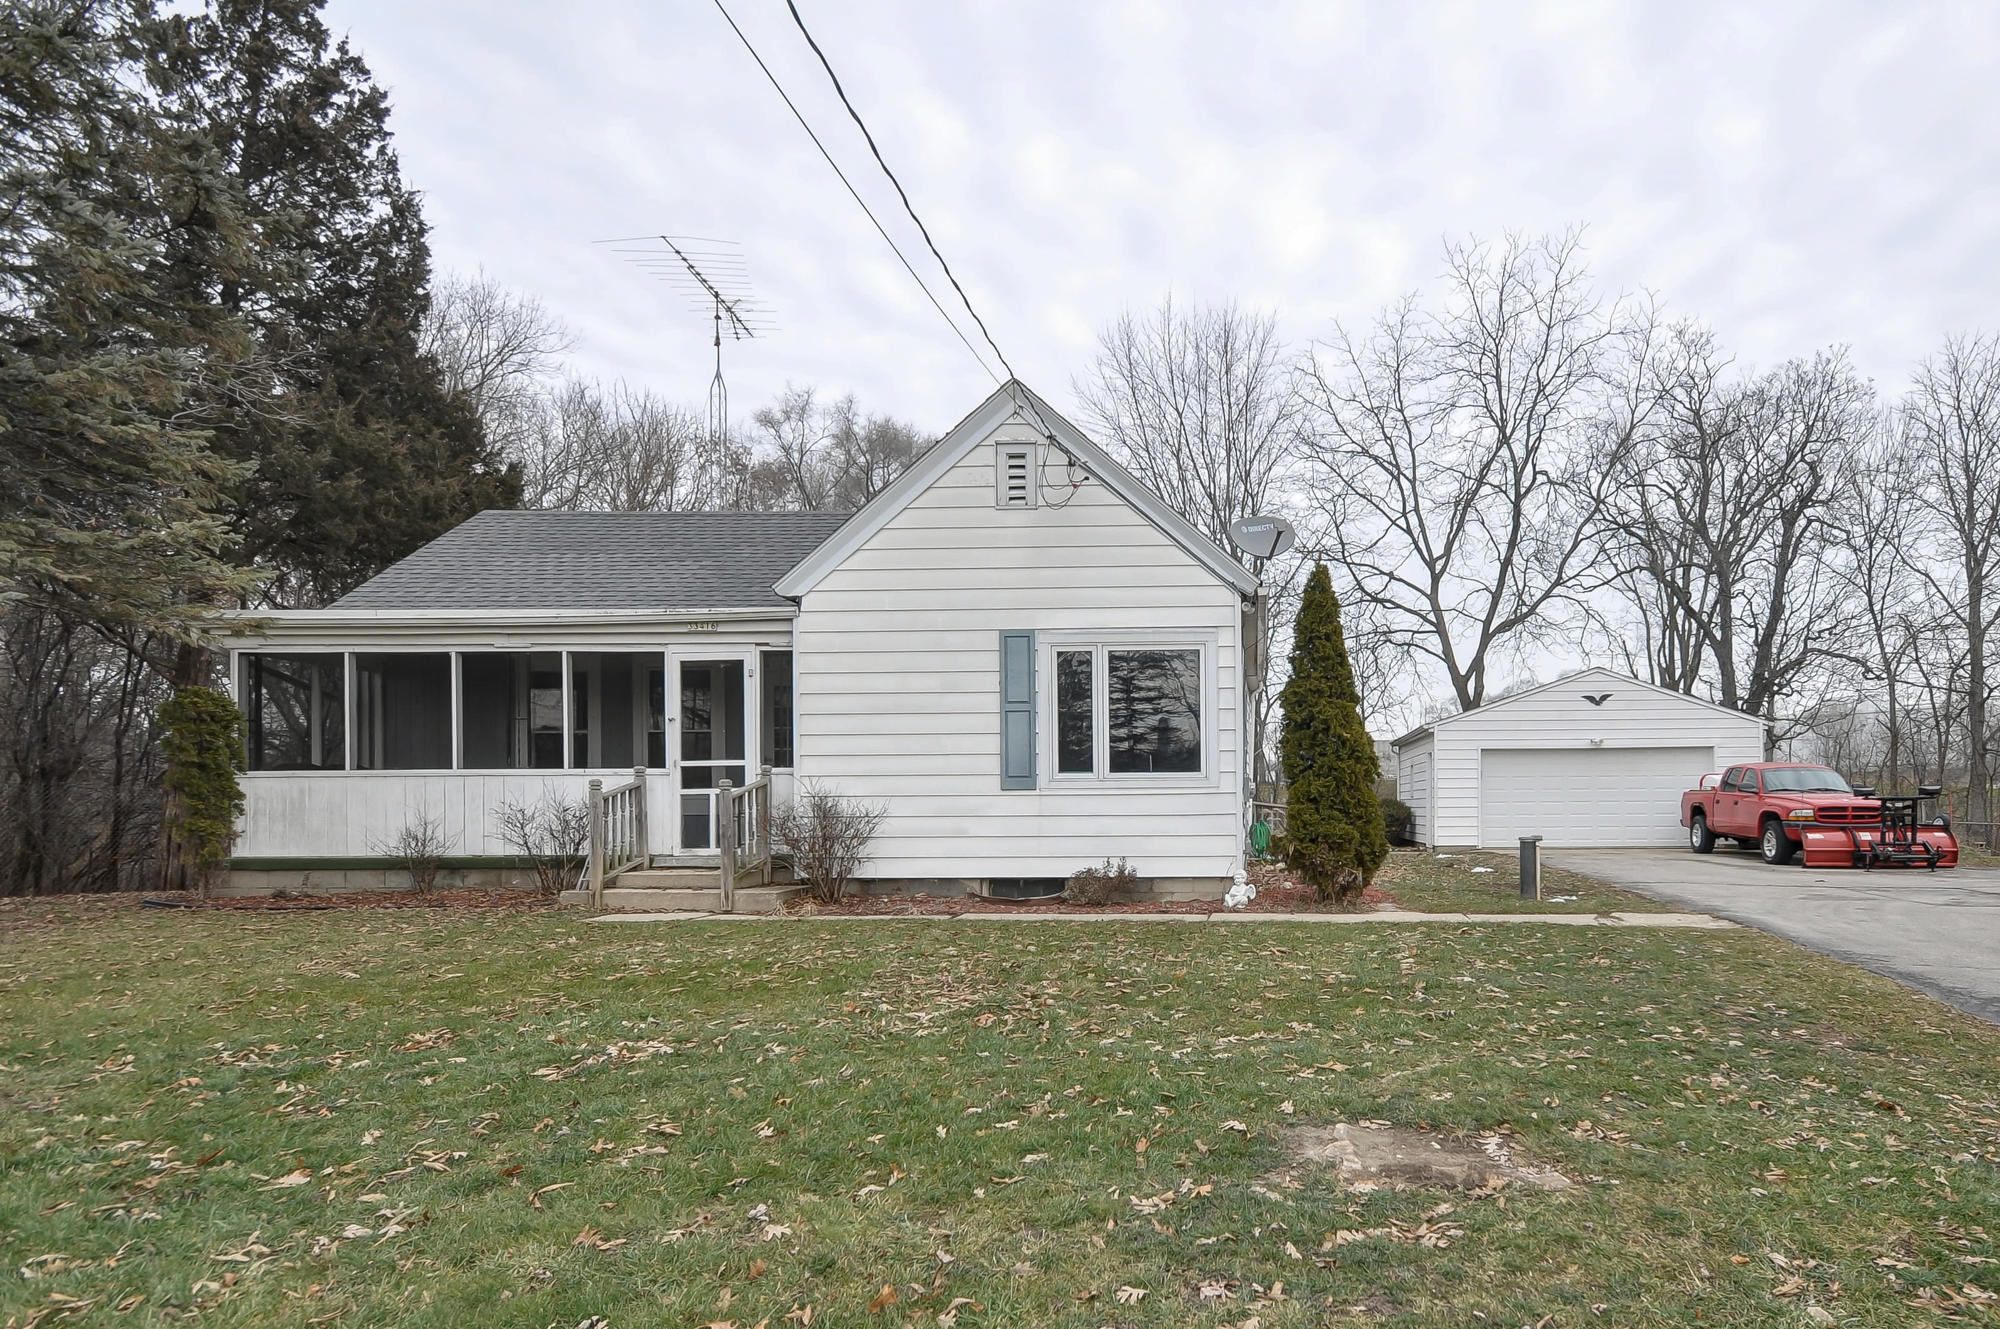 3 bed/1 bath Home in Burlington for $157,900